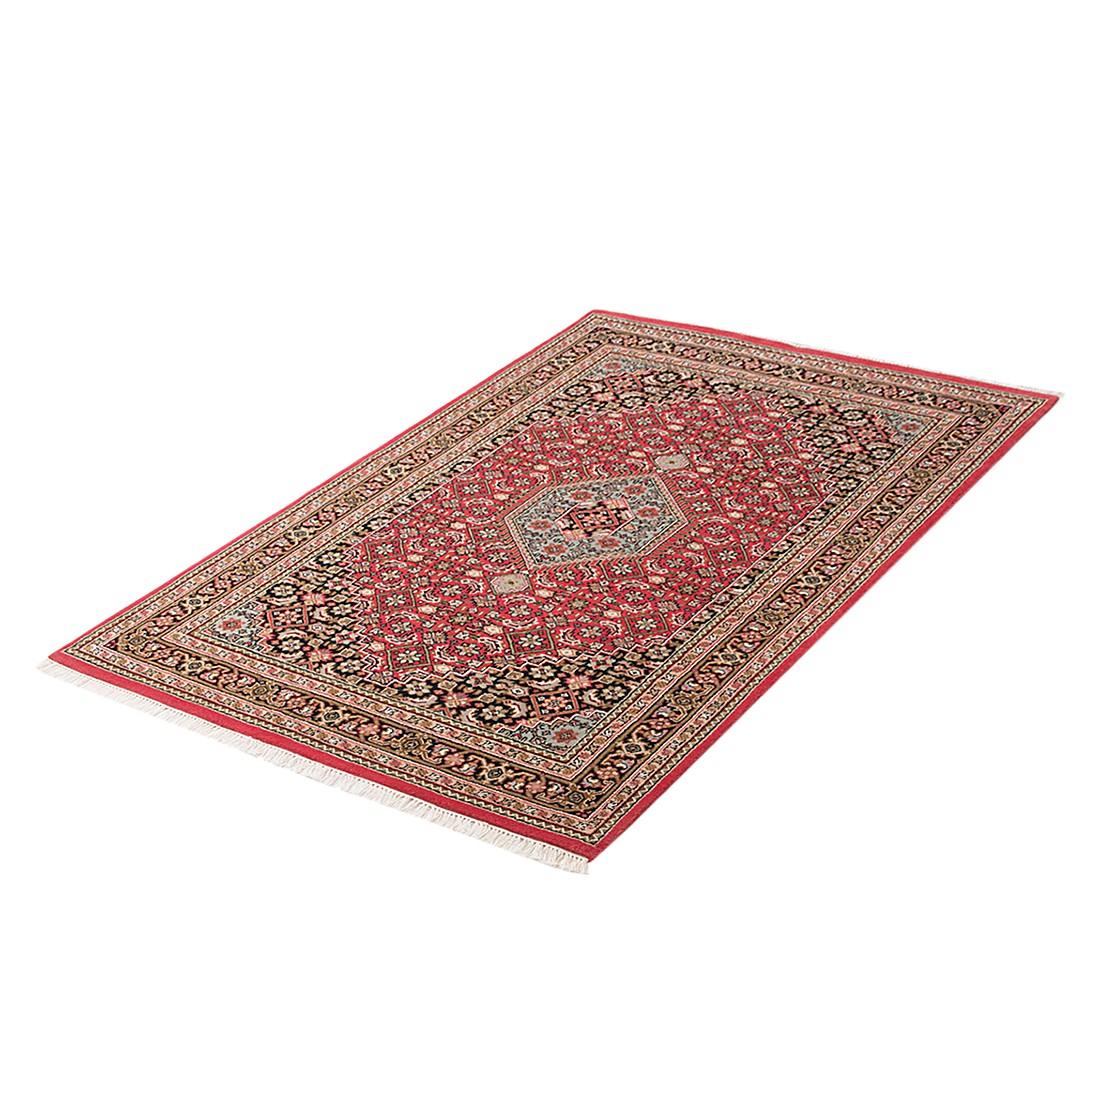 Tapijt Indo Royal Mumbai - rood 100% wol 60x90cm, Parwis